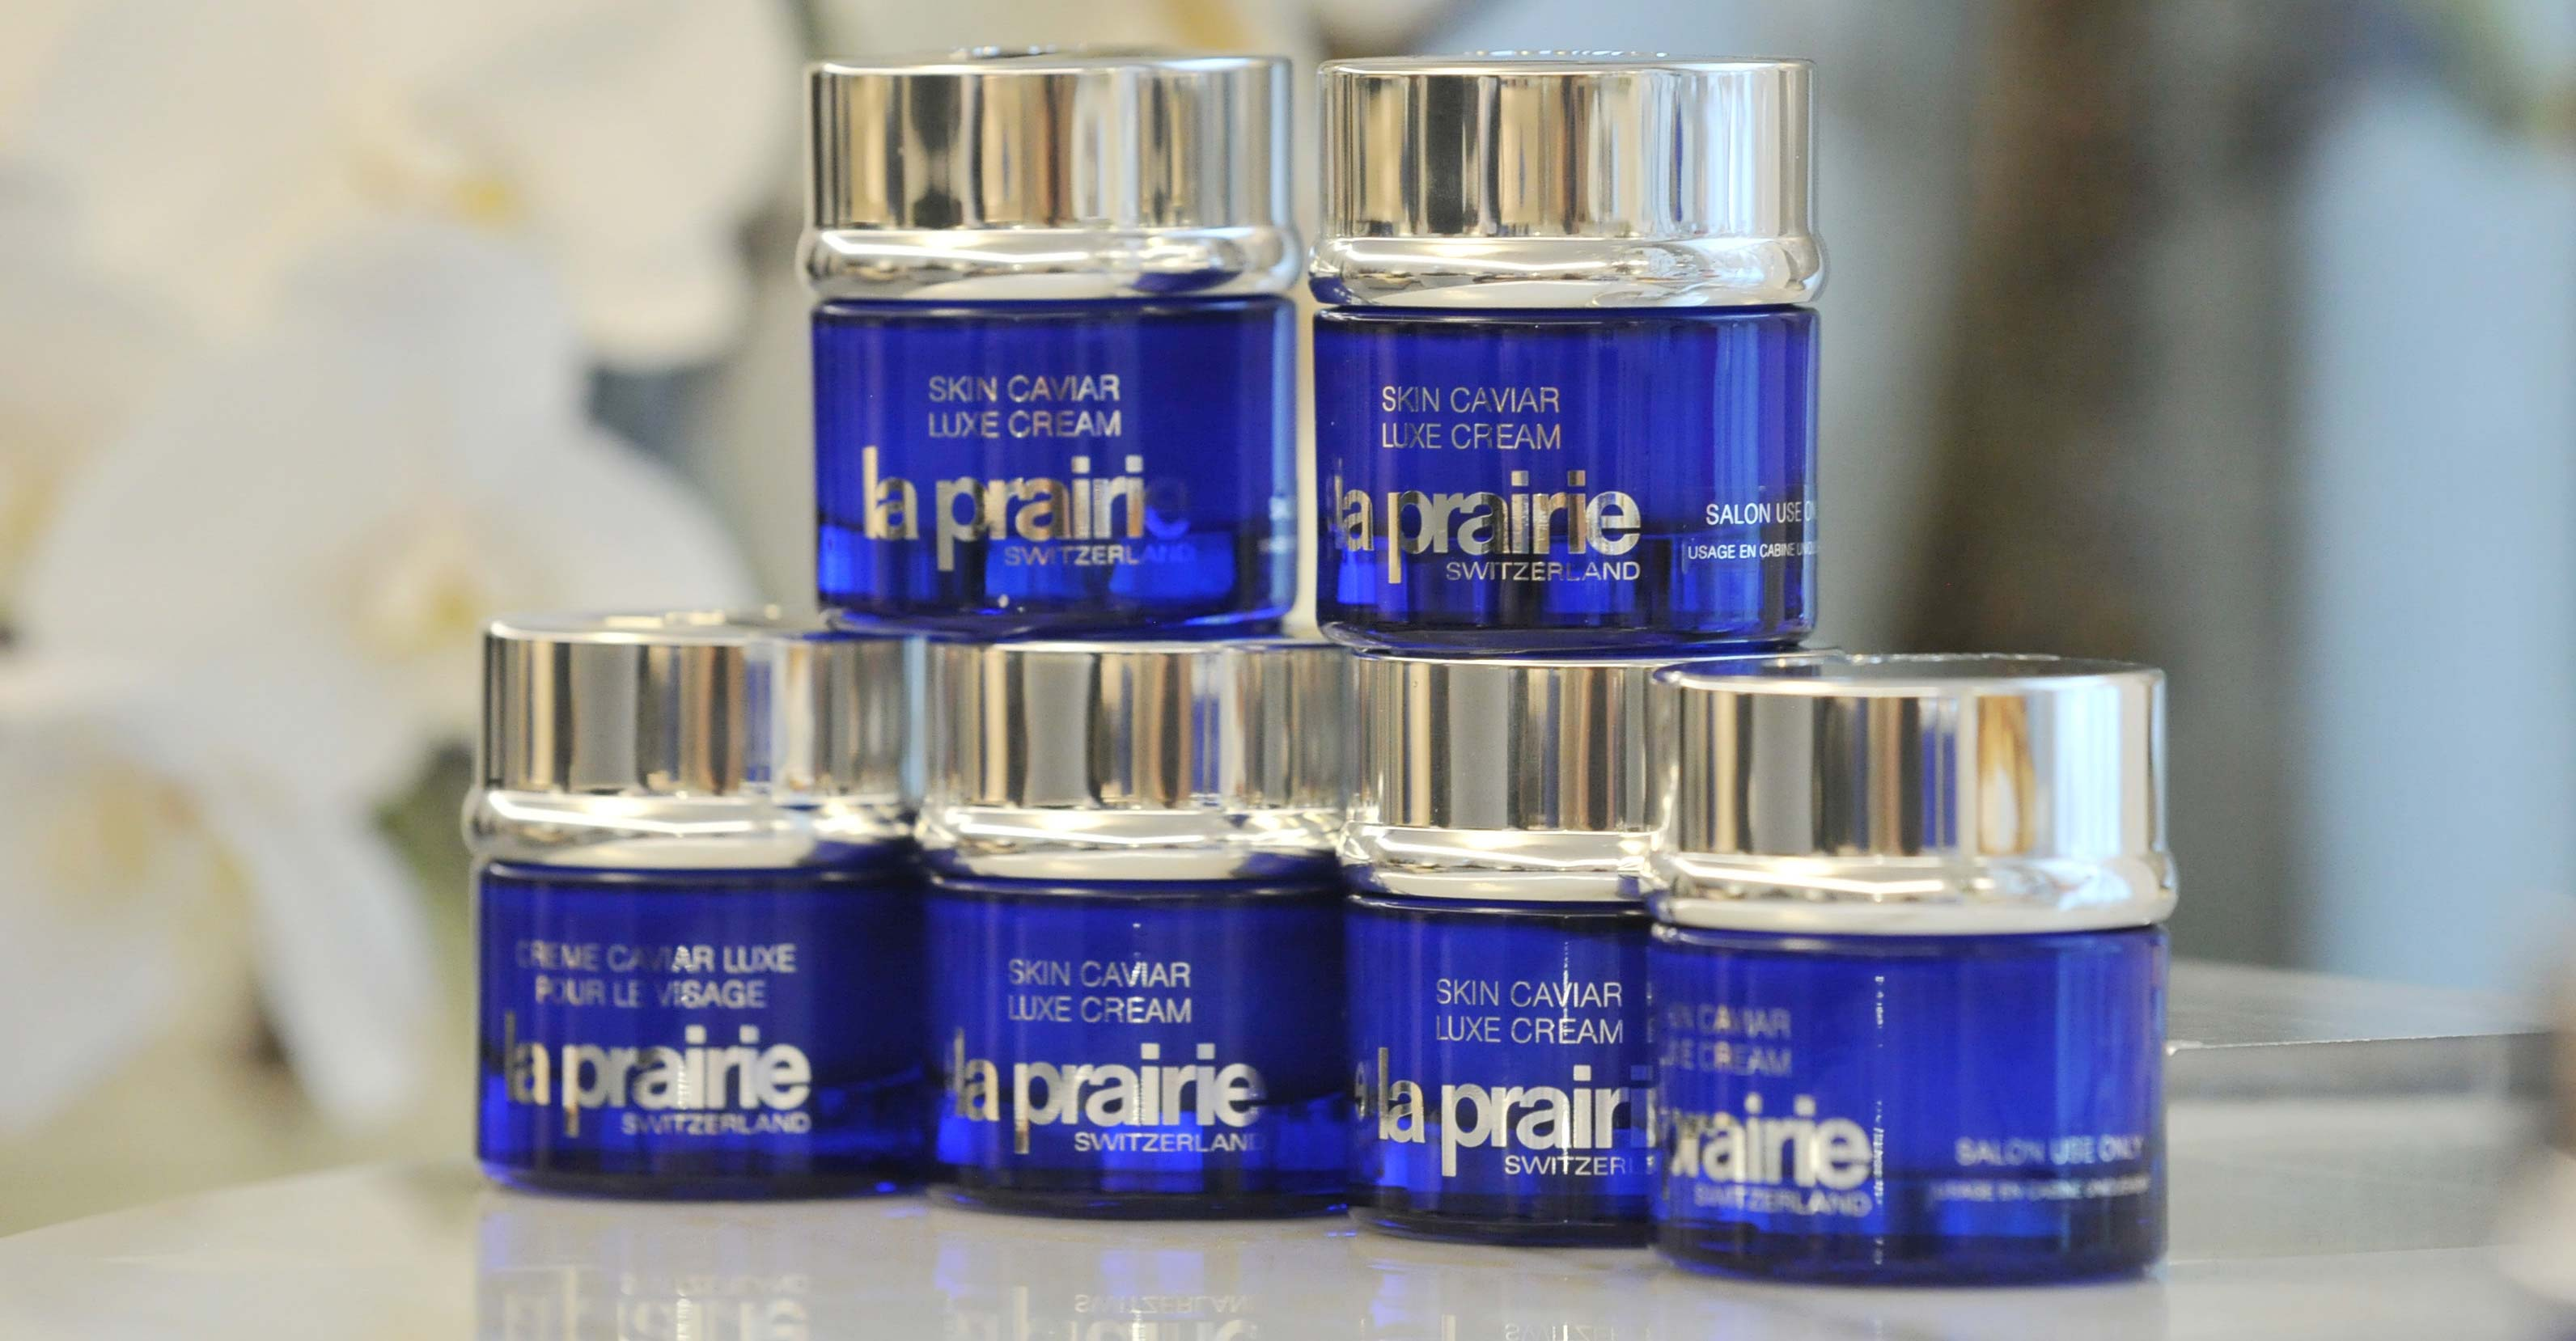 Win A La Prairie Skin Caviar Luxe Cream